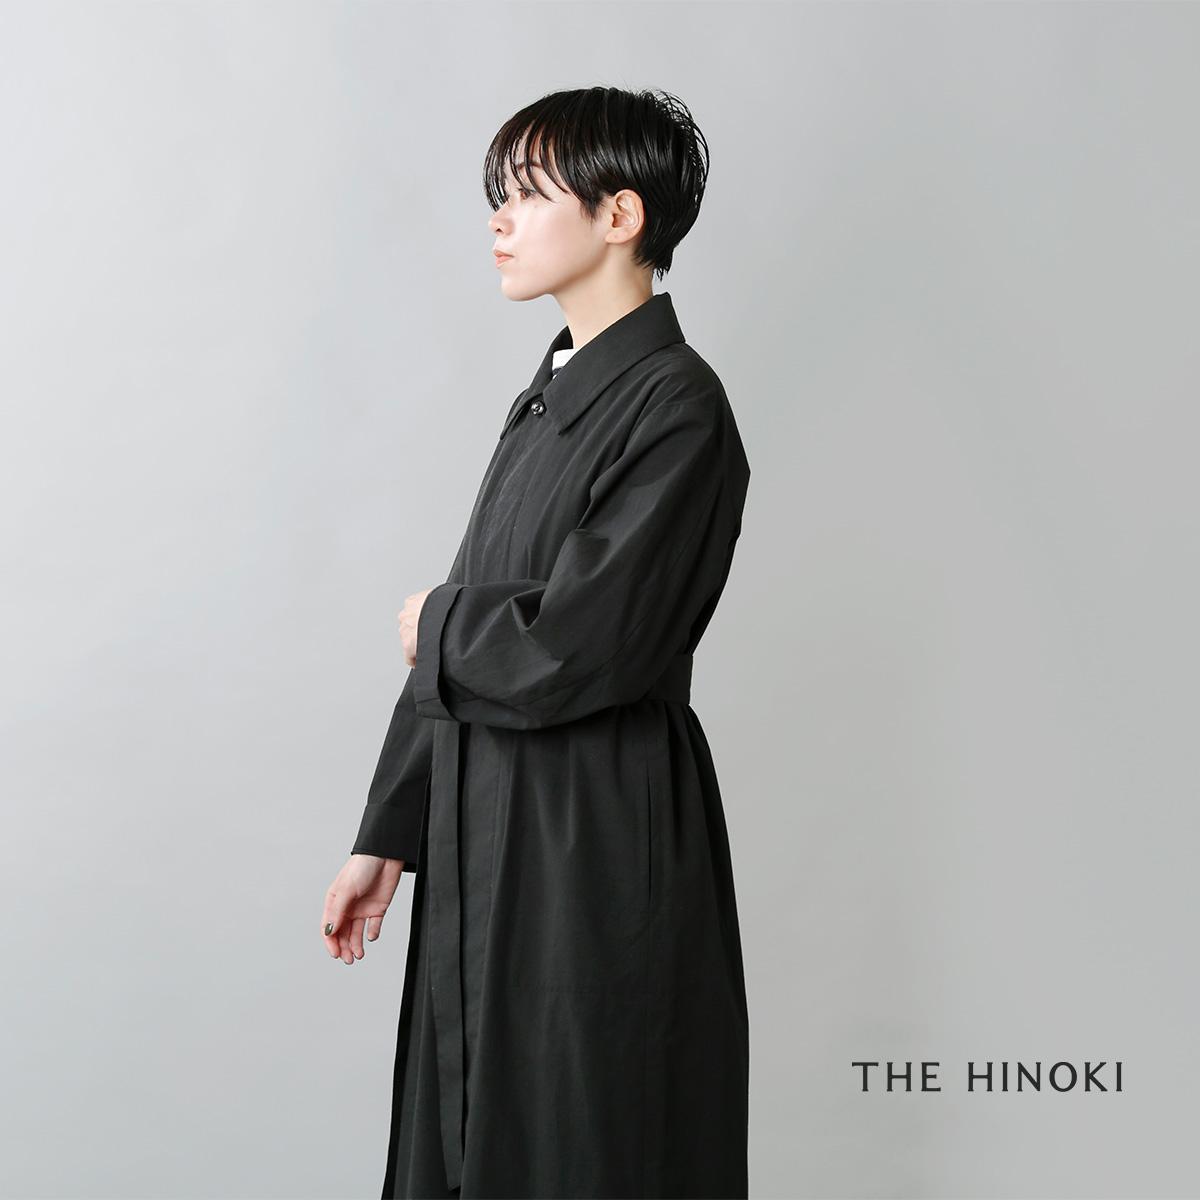 THE HINOKI(ザ ヒノキ)オーガニックコットンブロードポプリンコートドレス th20w-10